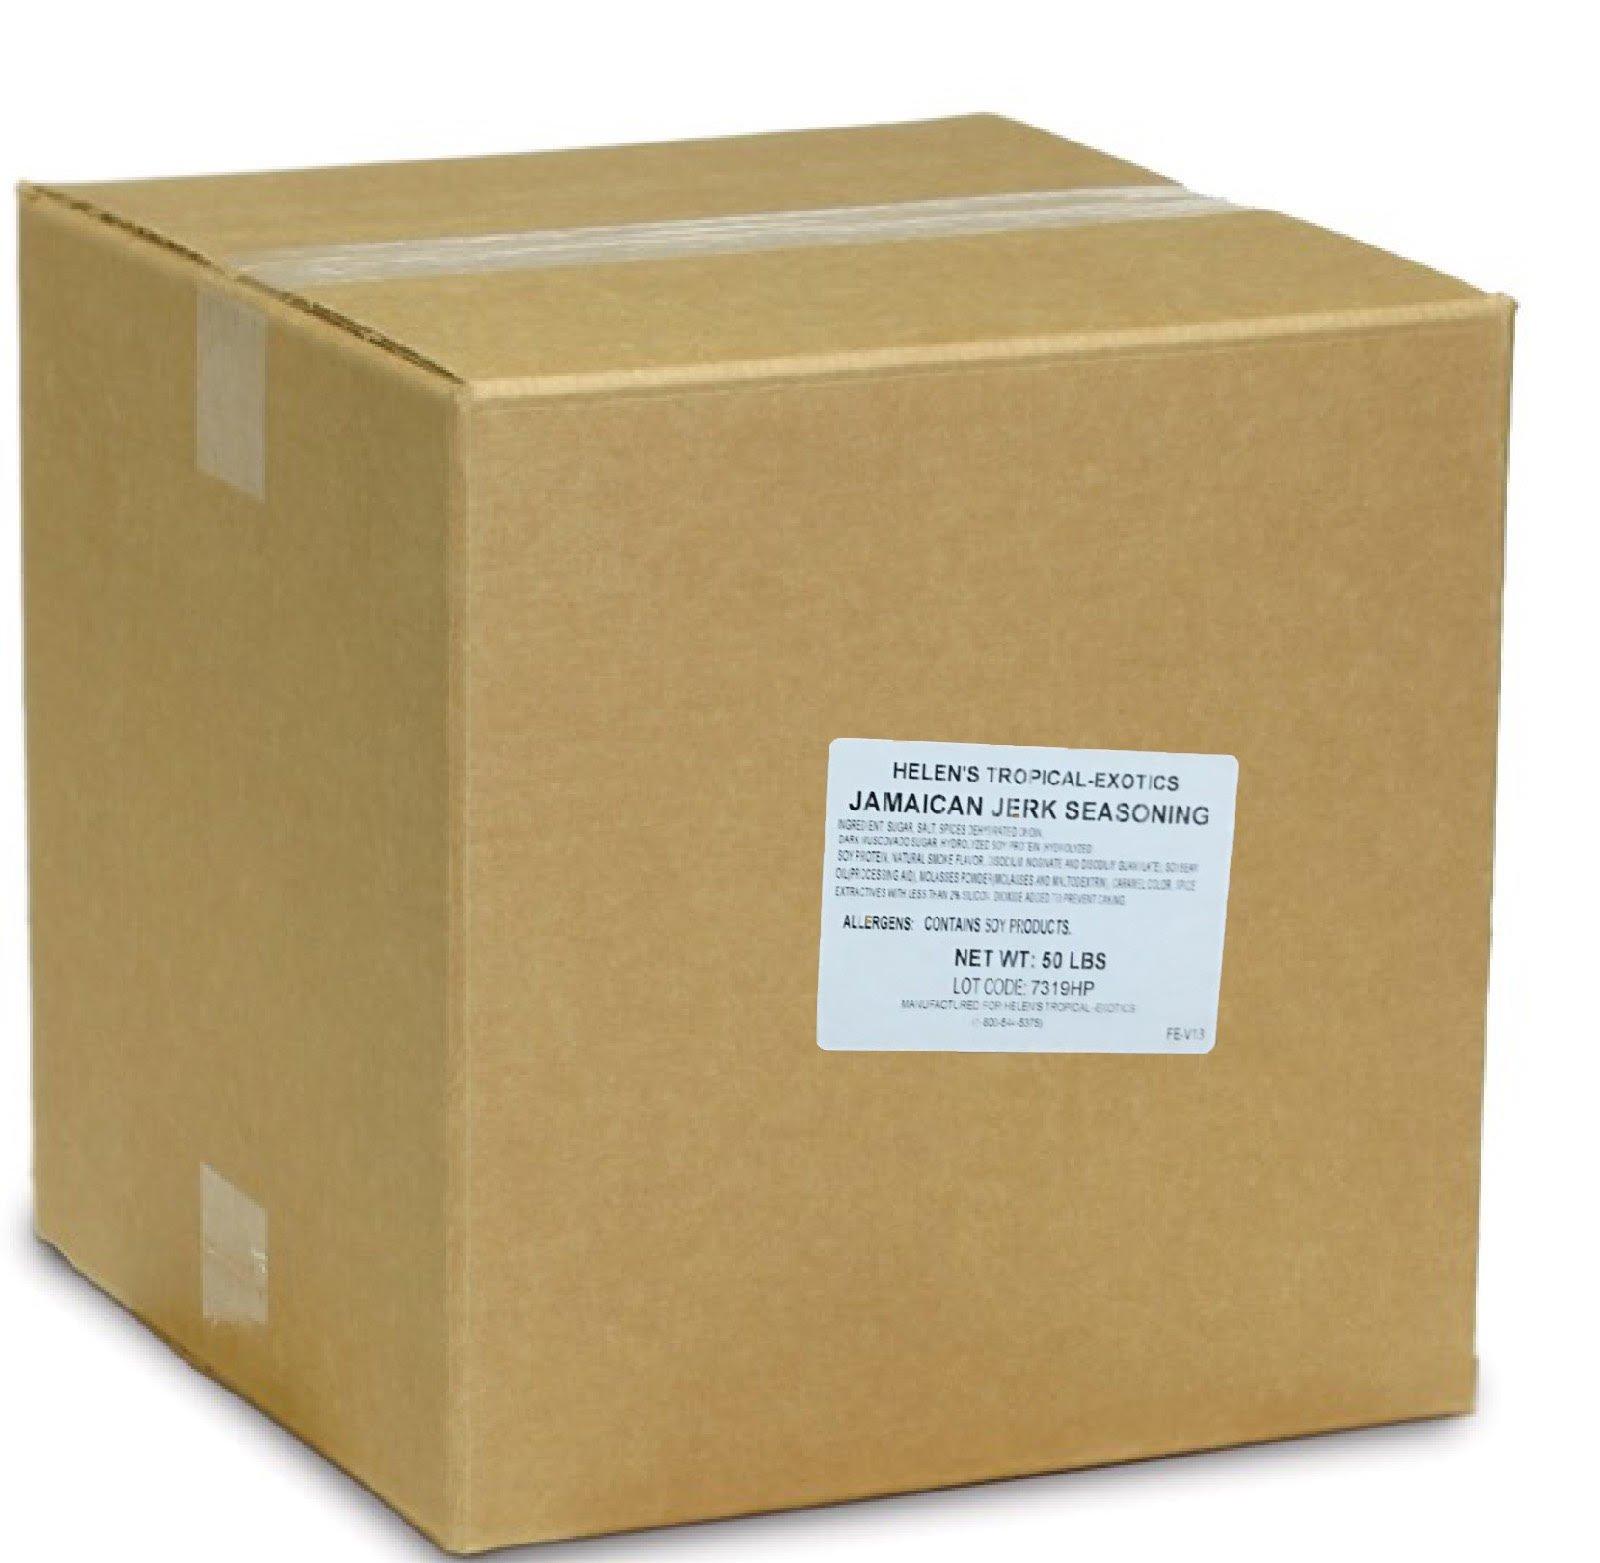 Helens Jamaican Jerk Seasoning - 50 lb Box - BBQ Caribbean Dry Rub